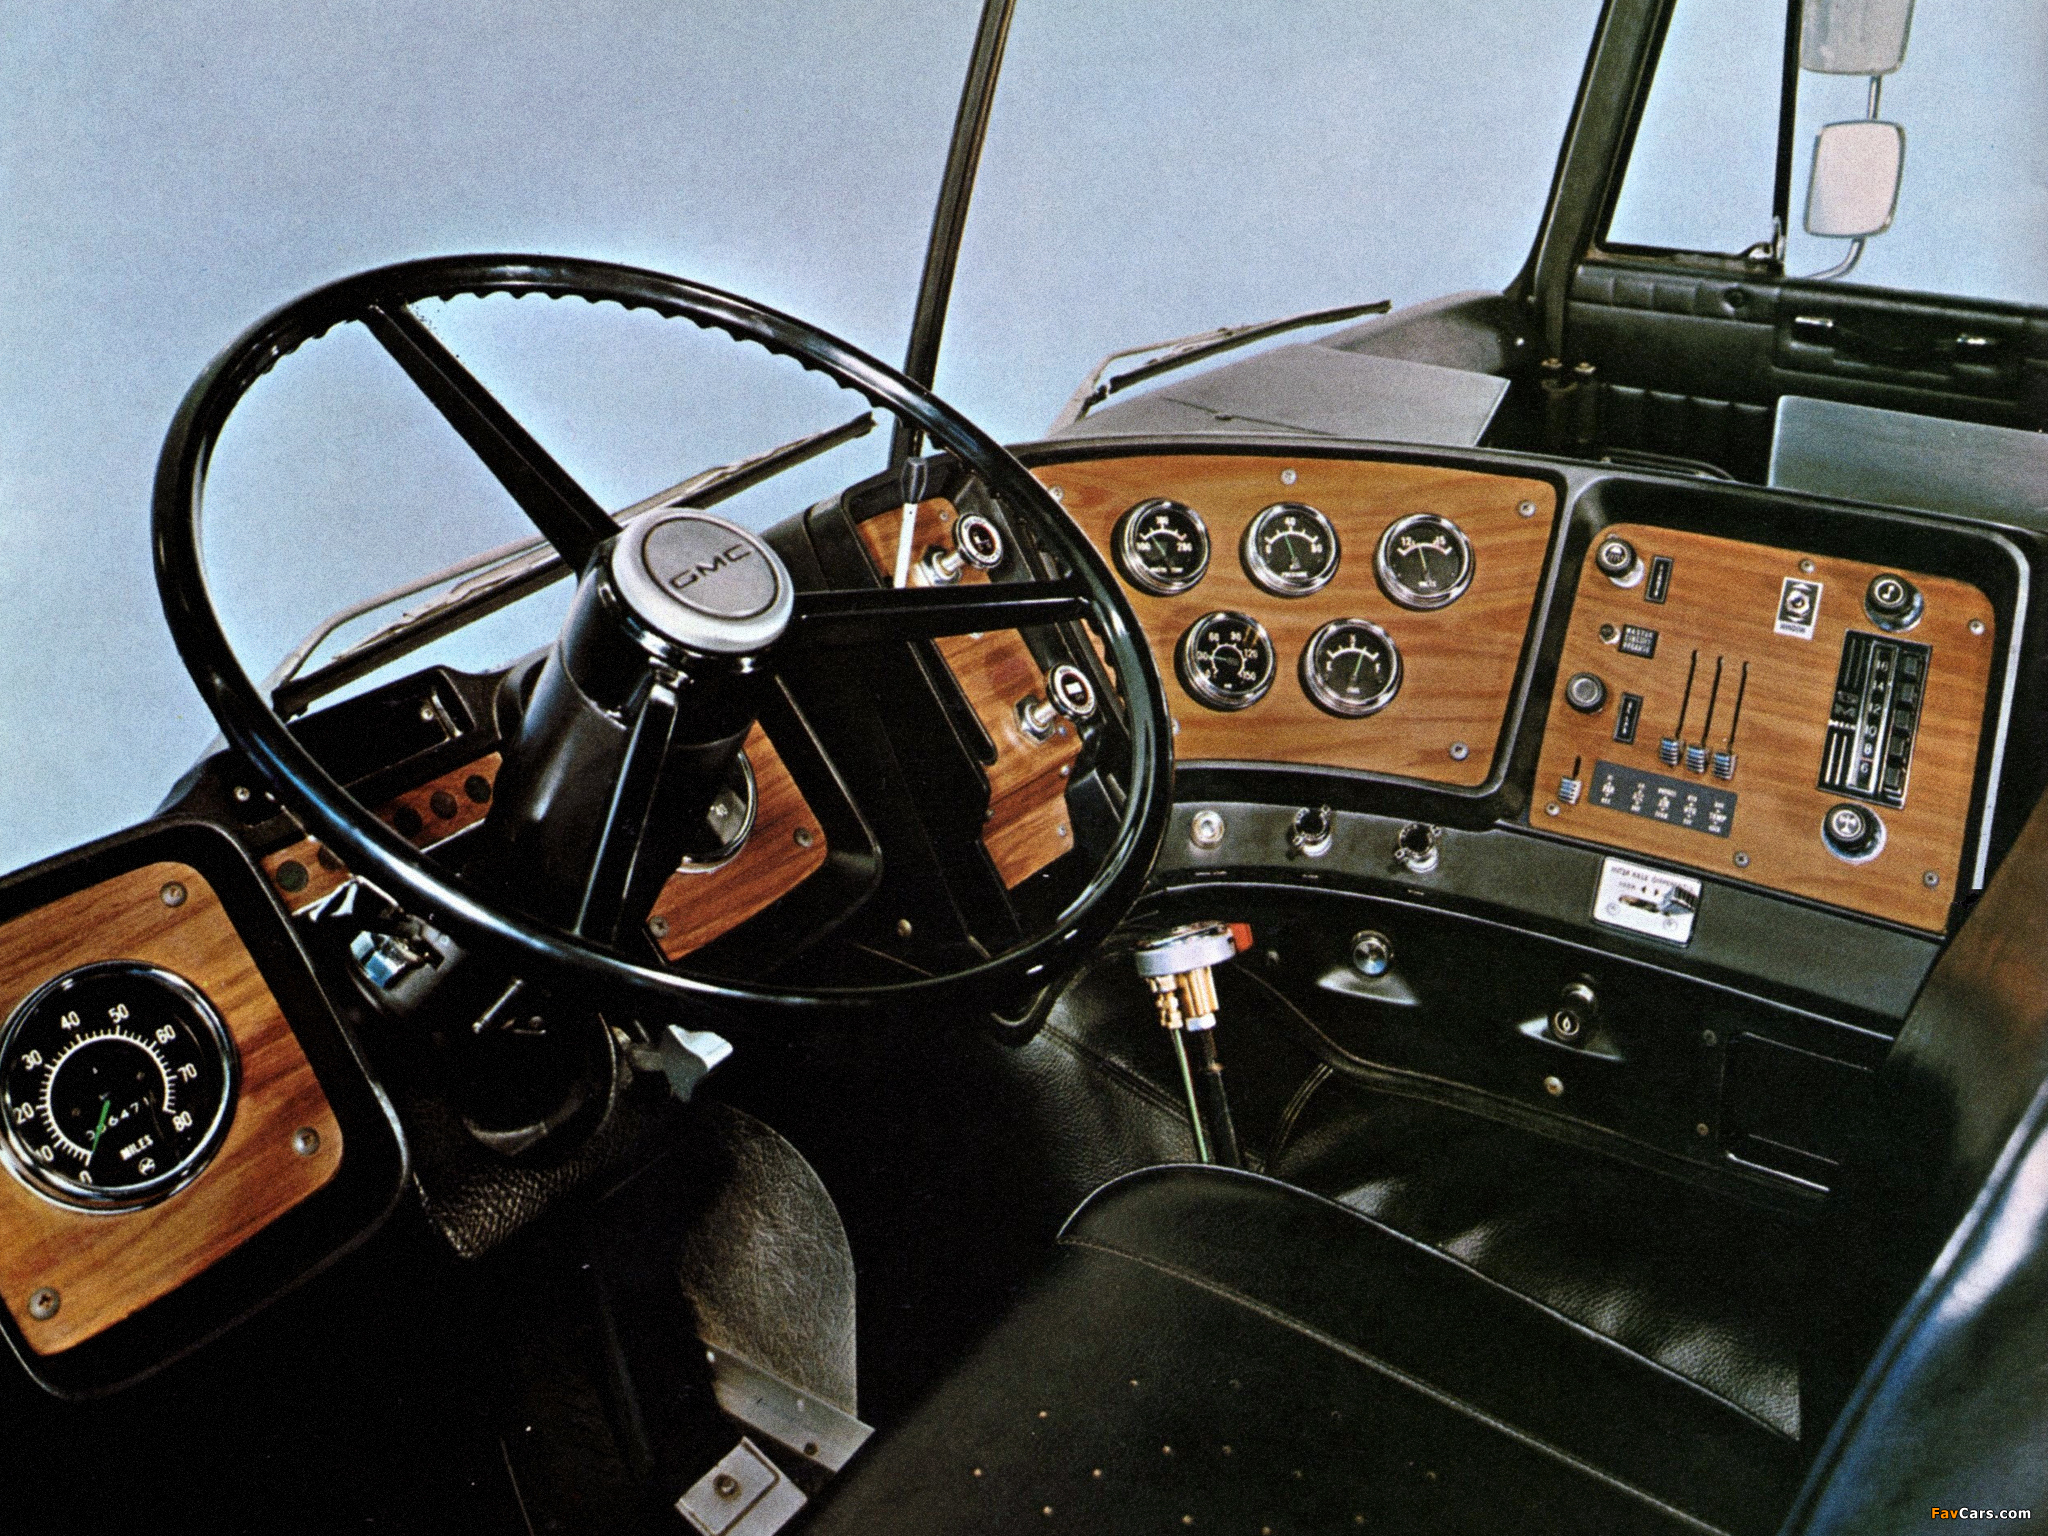 Gmc Astro 95 1968 88 Images 2048x1536